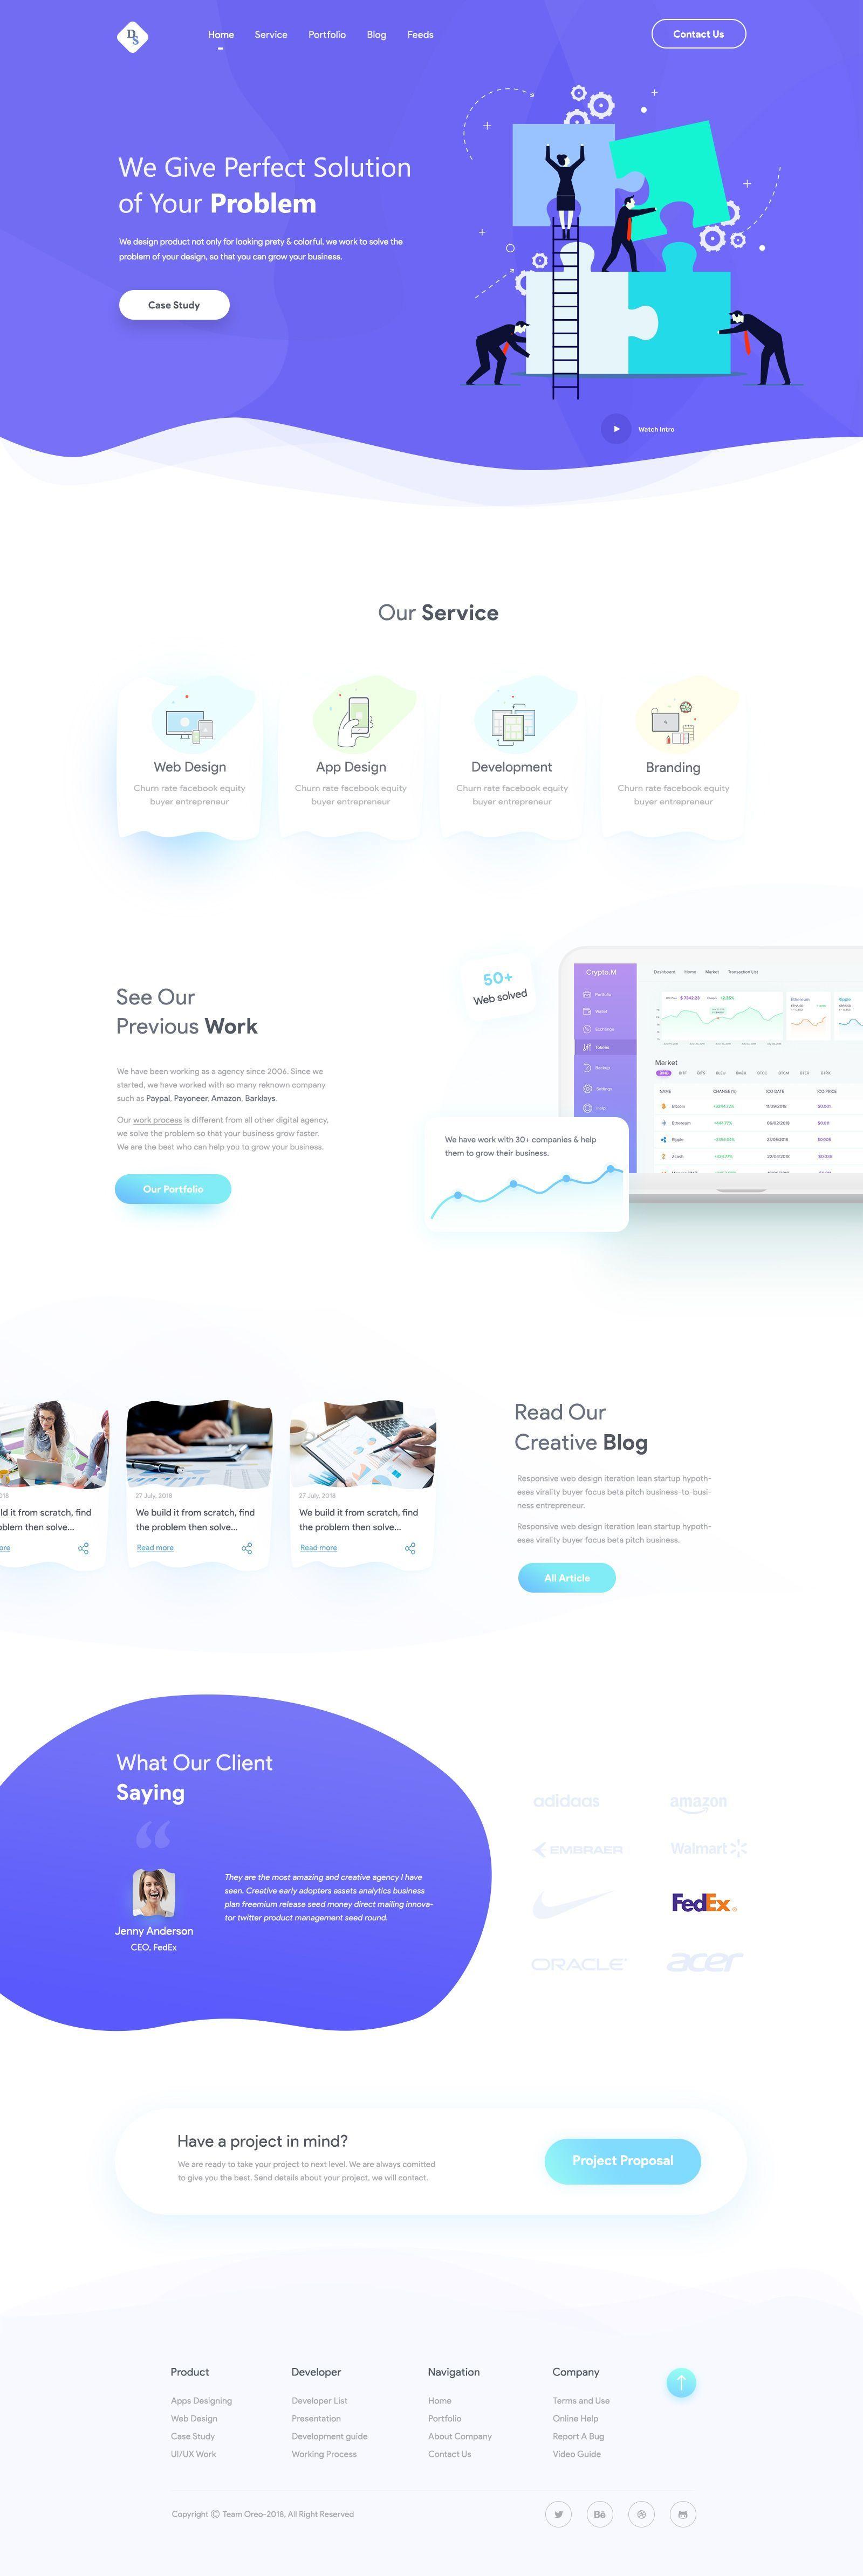 Ds Agency2 Jpg By Ariful Islam In 2020 Website Design Layout Web App Design App Design Inspiration